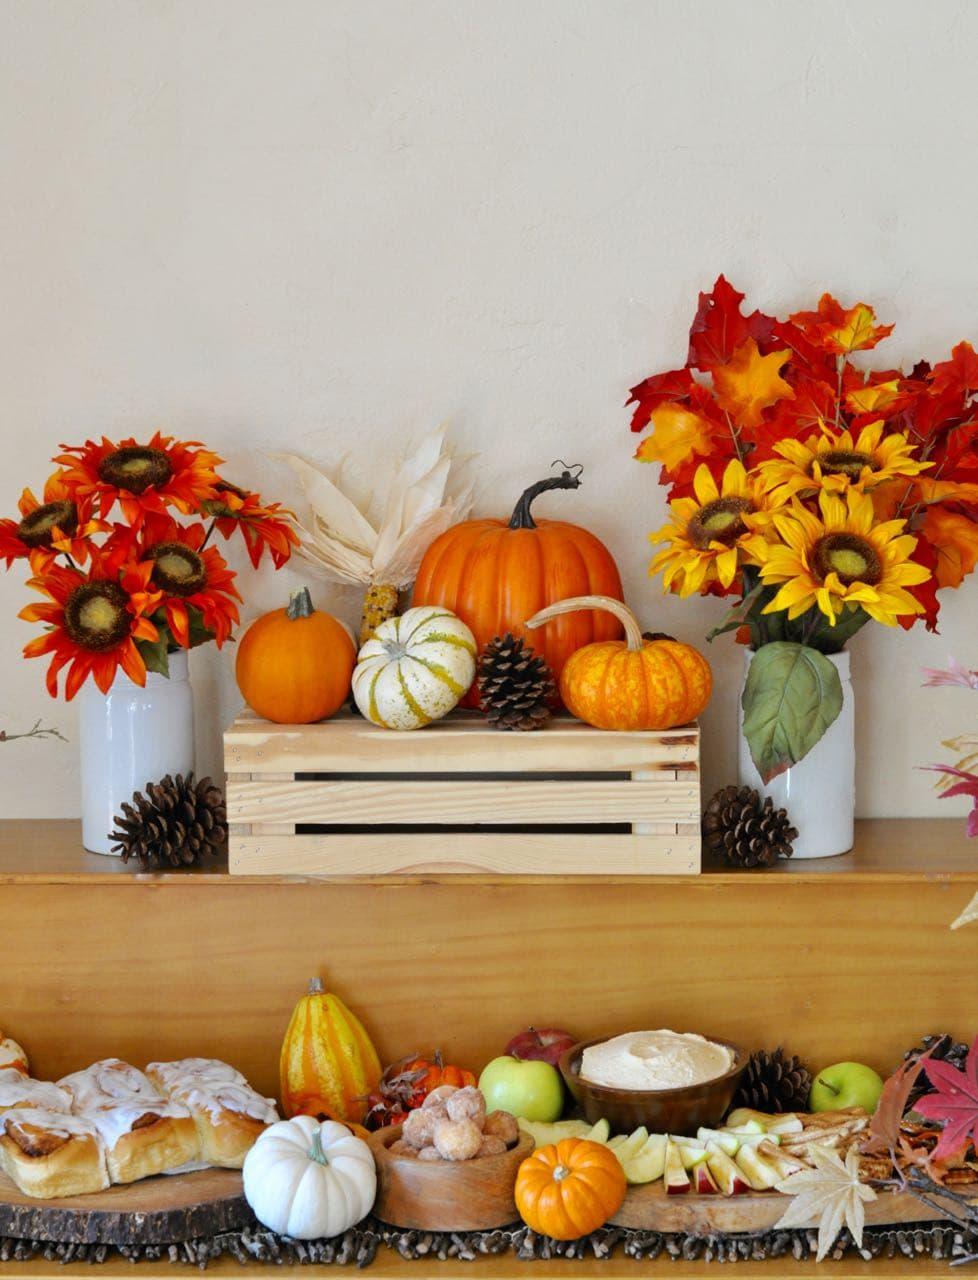 Fall get together and pumpkin cheesecake dip recipe make